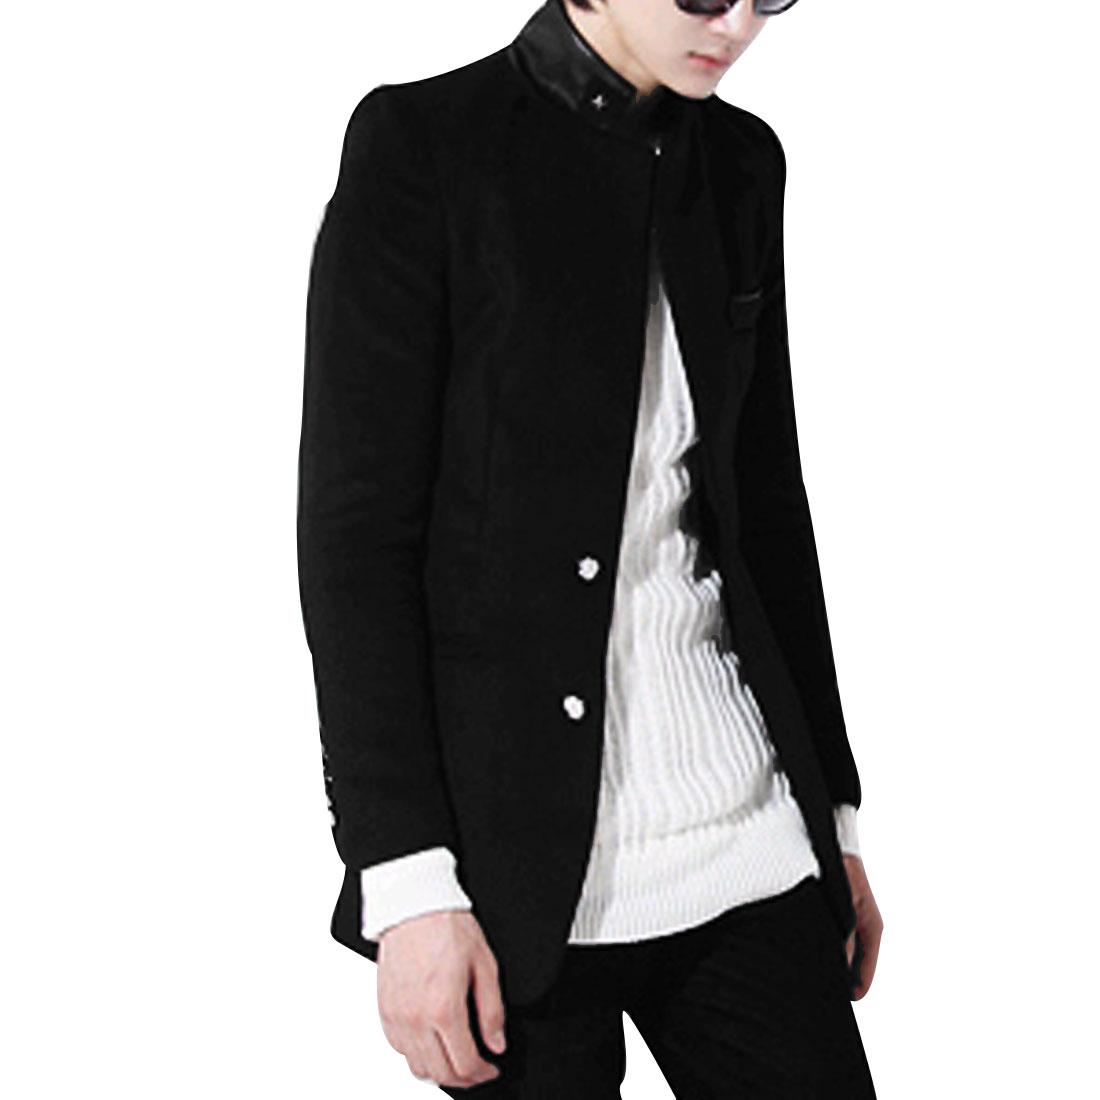 Men M Black Stand Collar Long Sleeve Design Slim Fit Casual Fleece Jacket